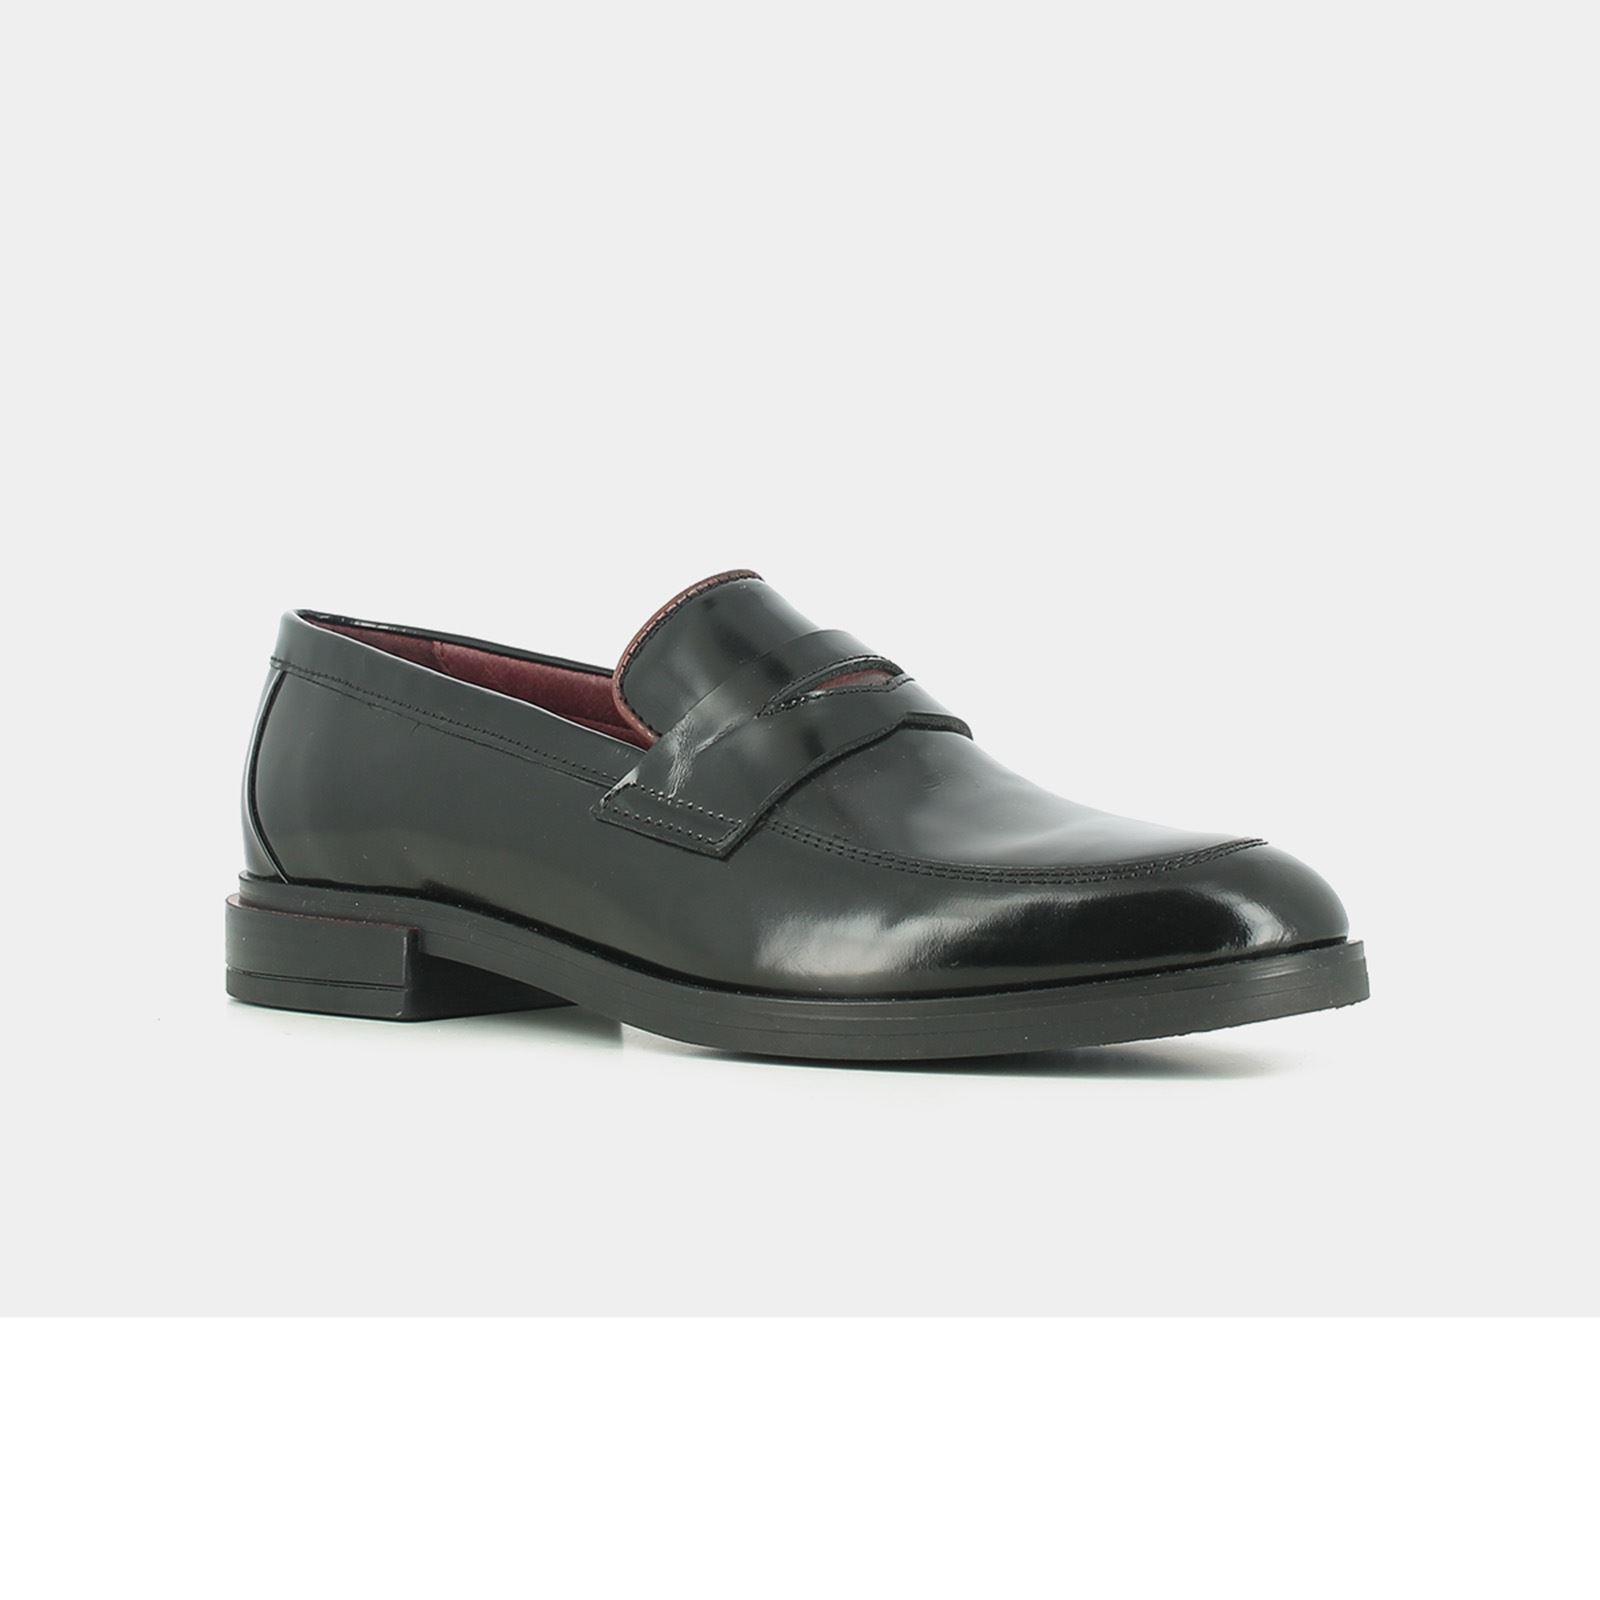 BD0703, Mocassins (Loafers) Femme - Multicolore (Blanc/Noir), 41Barracuda